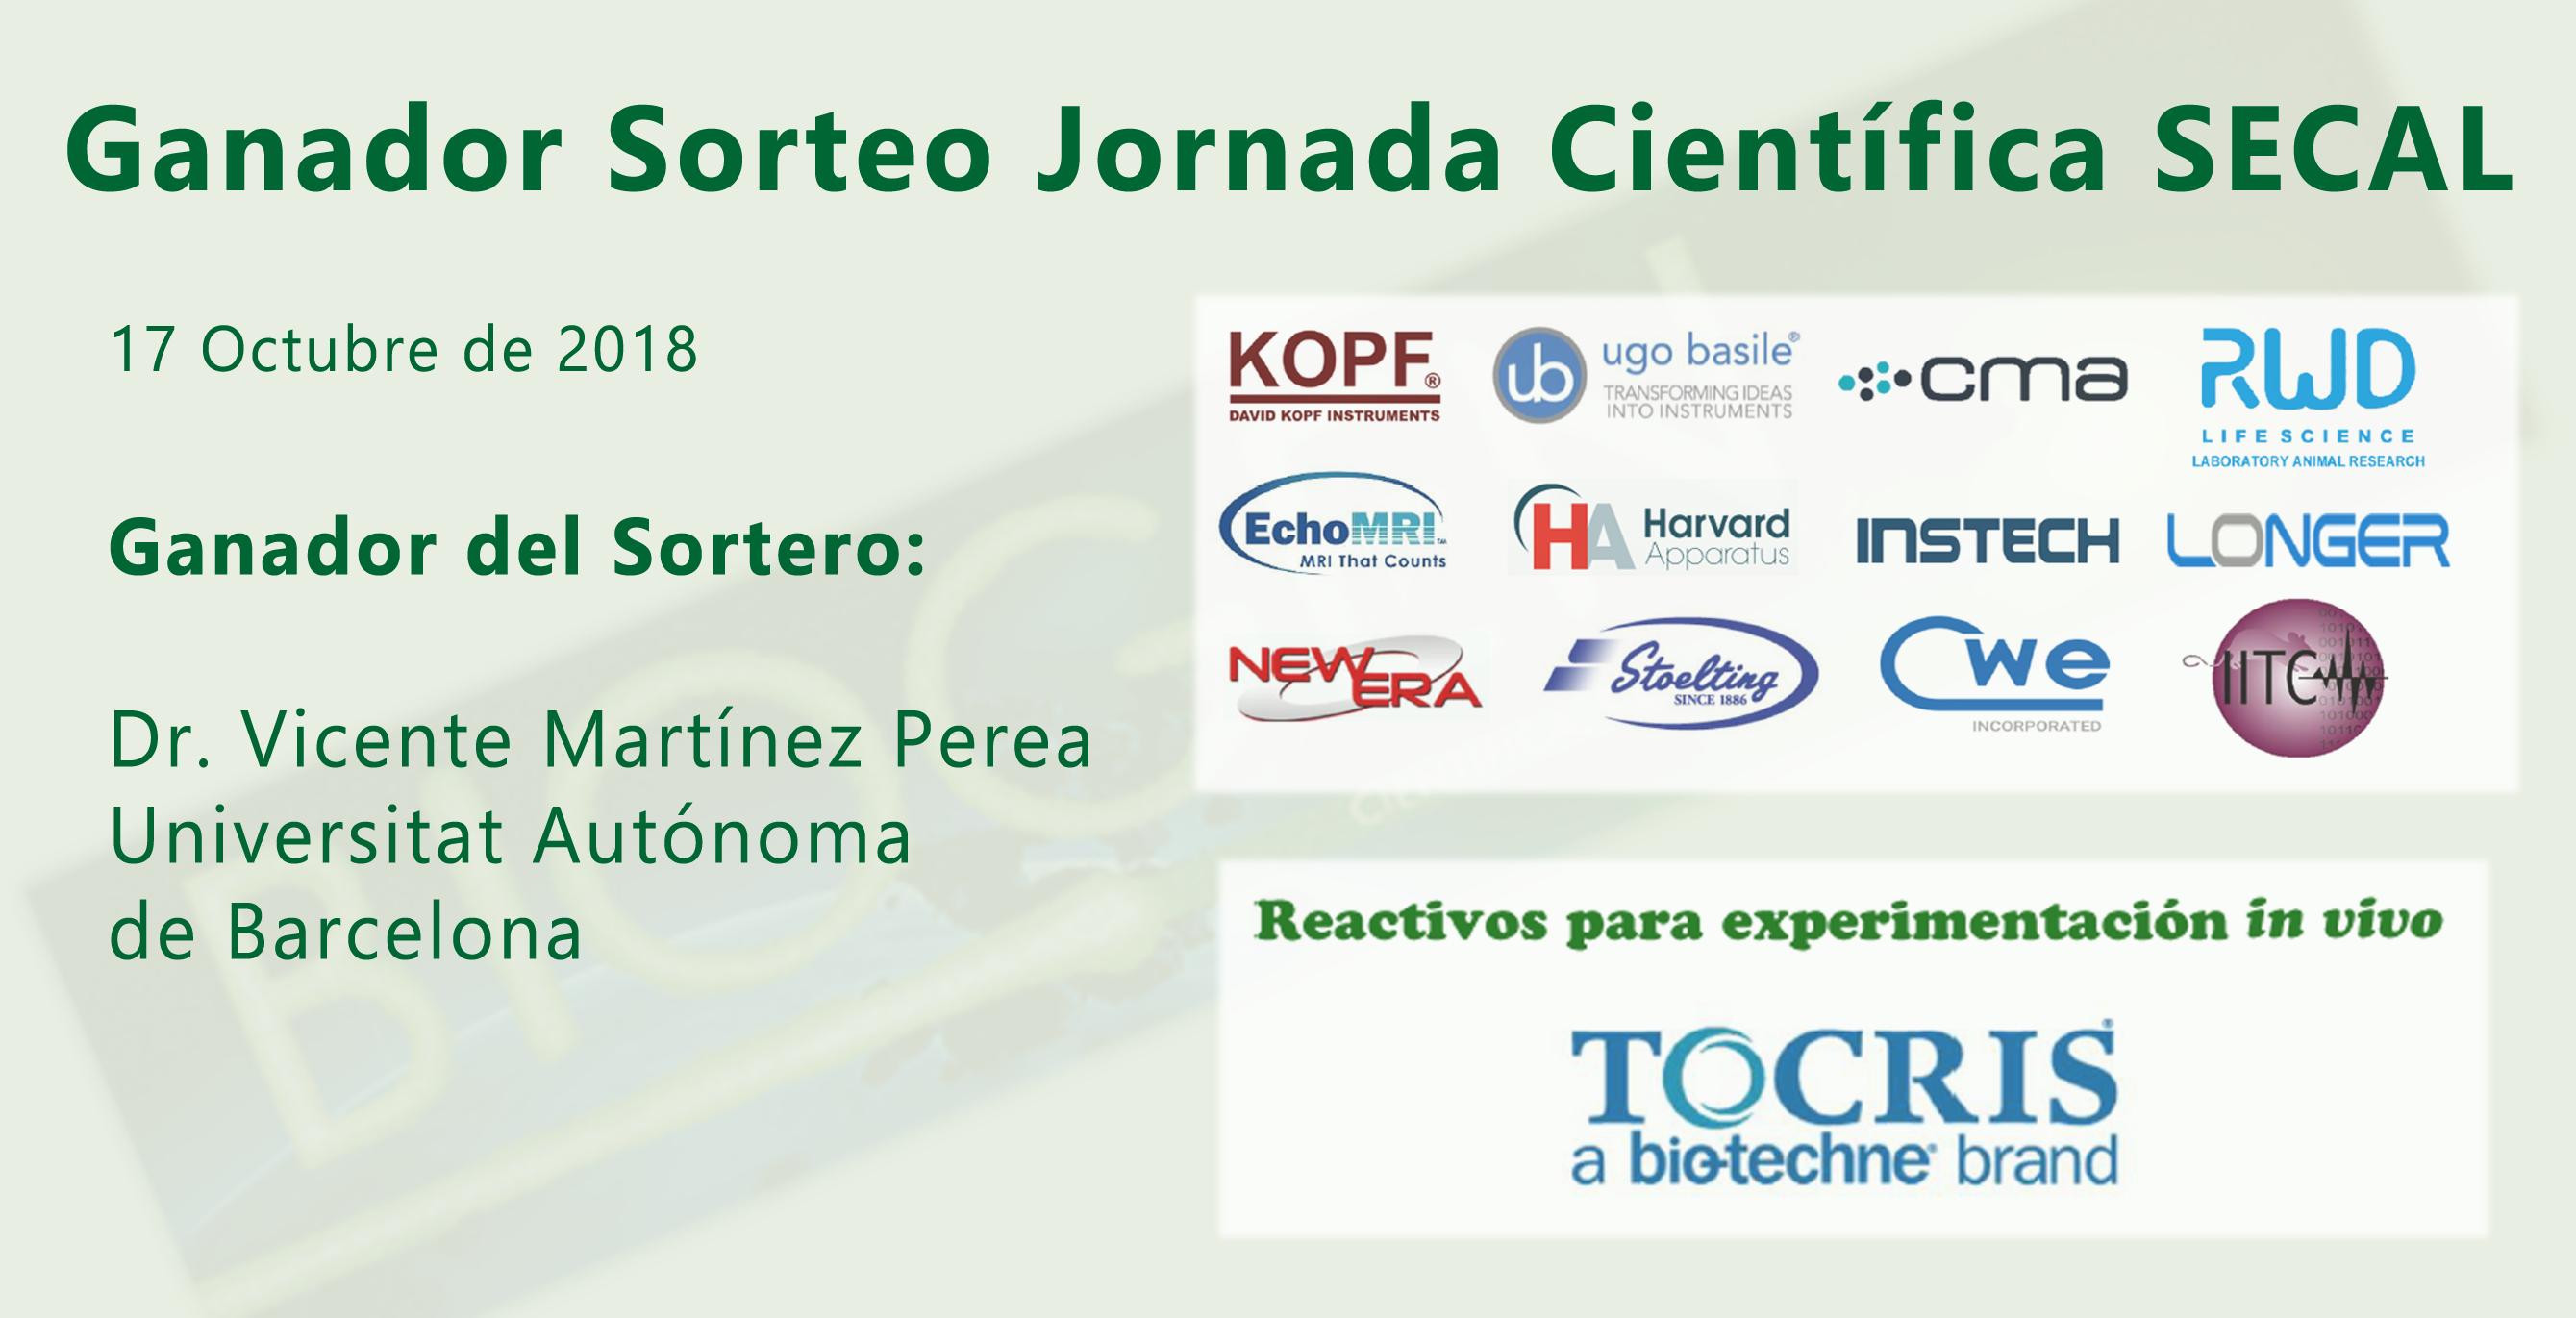 Ganador Sorteo Jornada Cientifica  - SECAL 17/10/2018